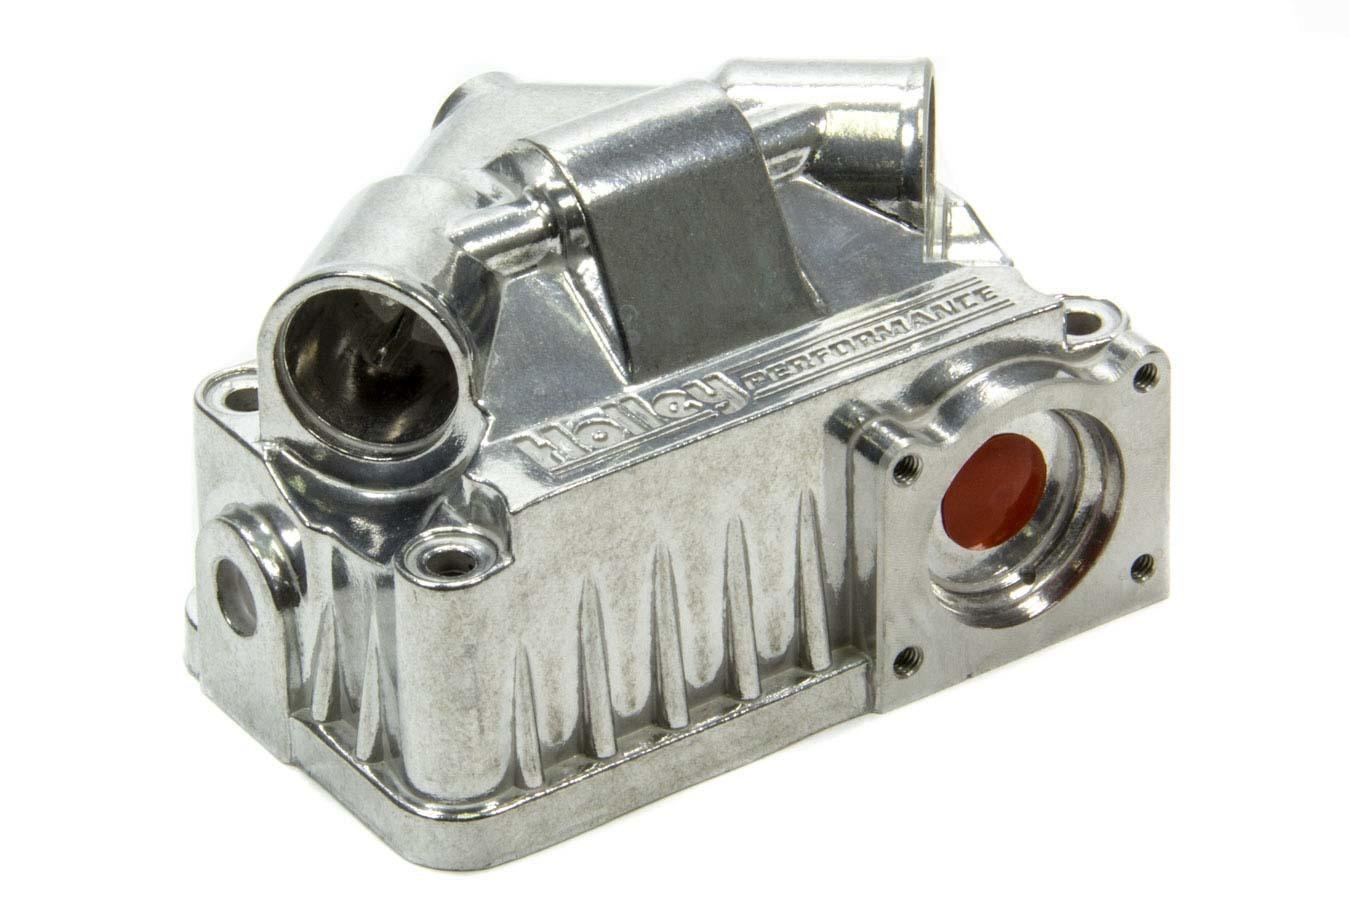 Advanced Engine Design Secondary Float Bowl - Double Pump